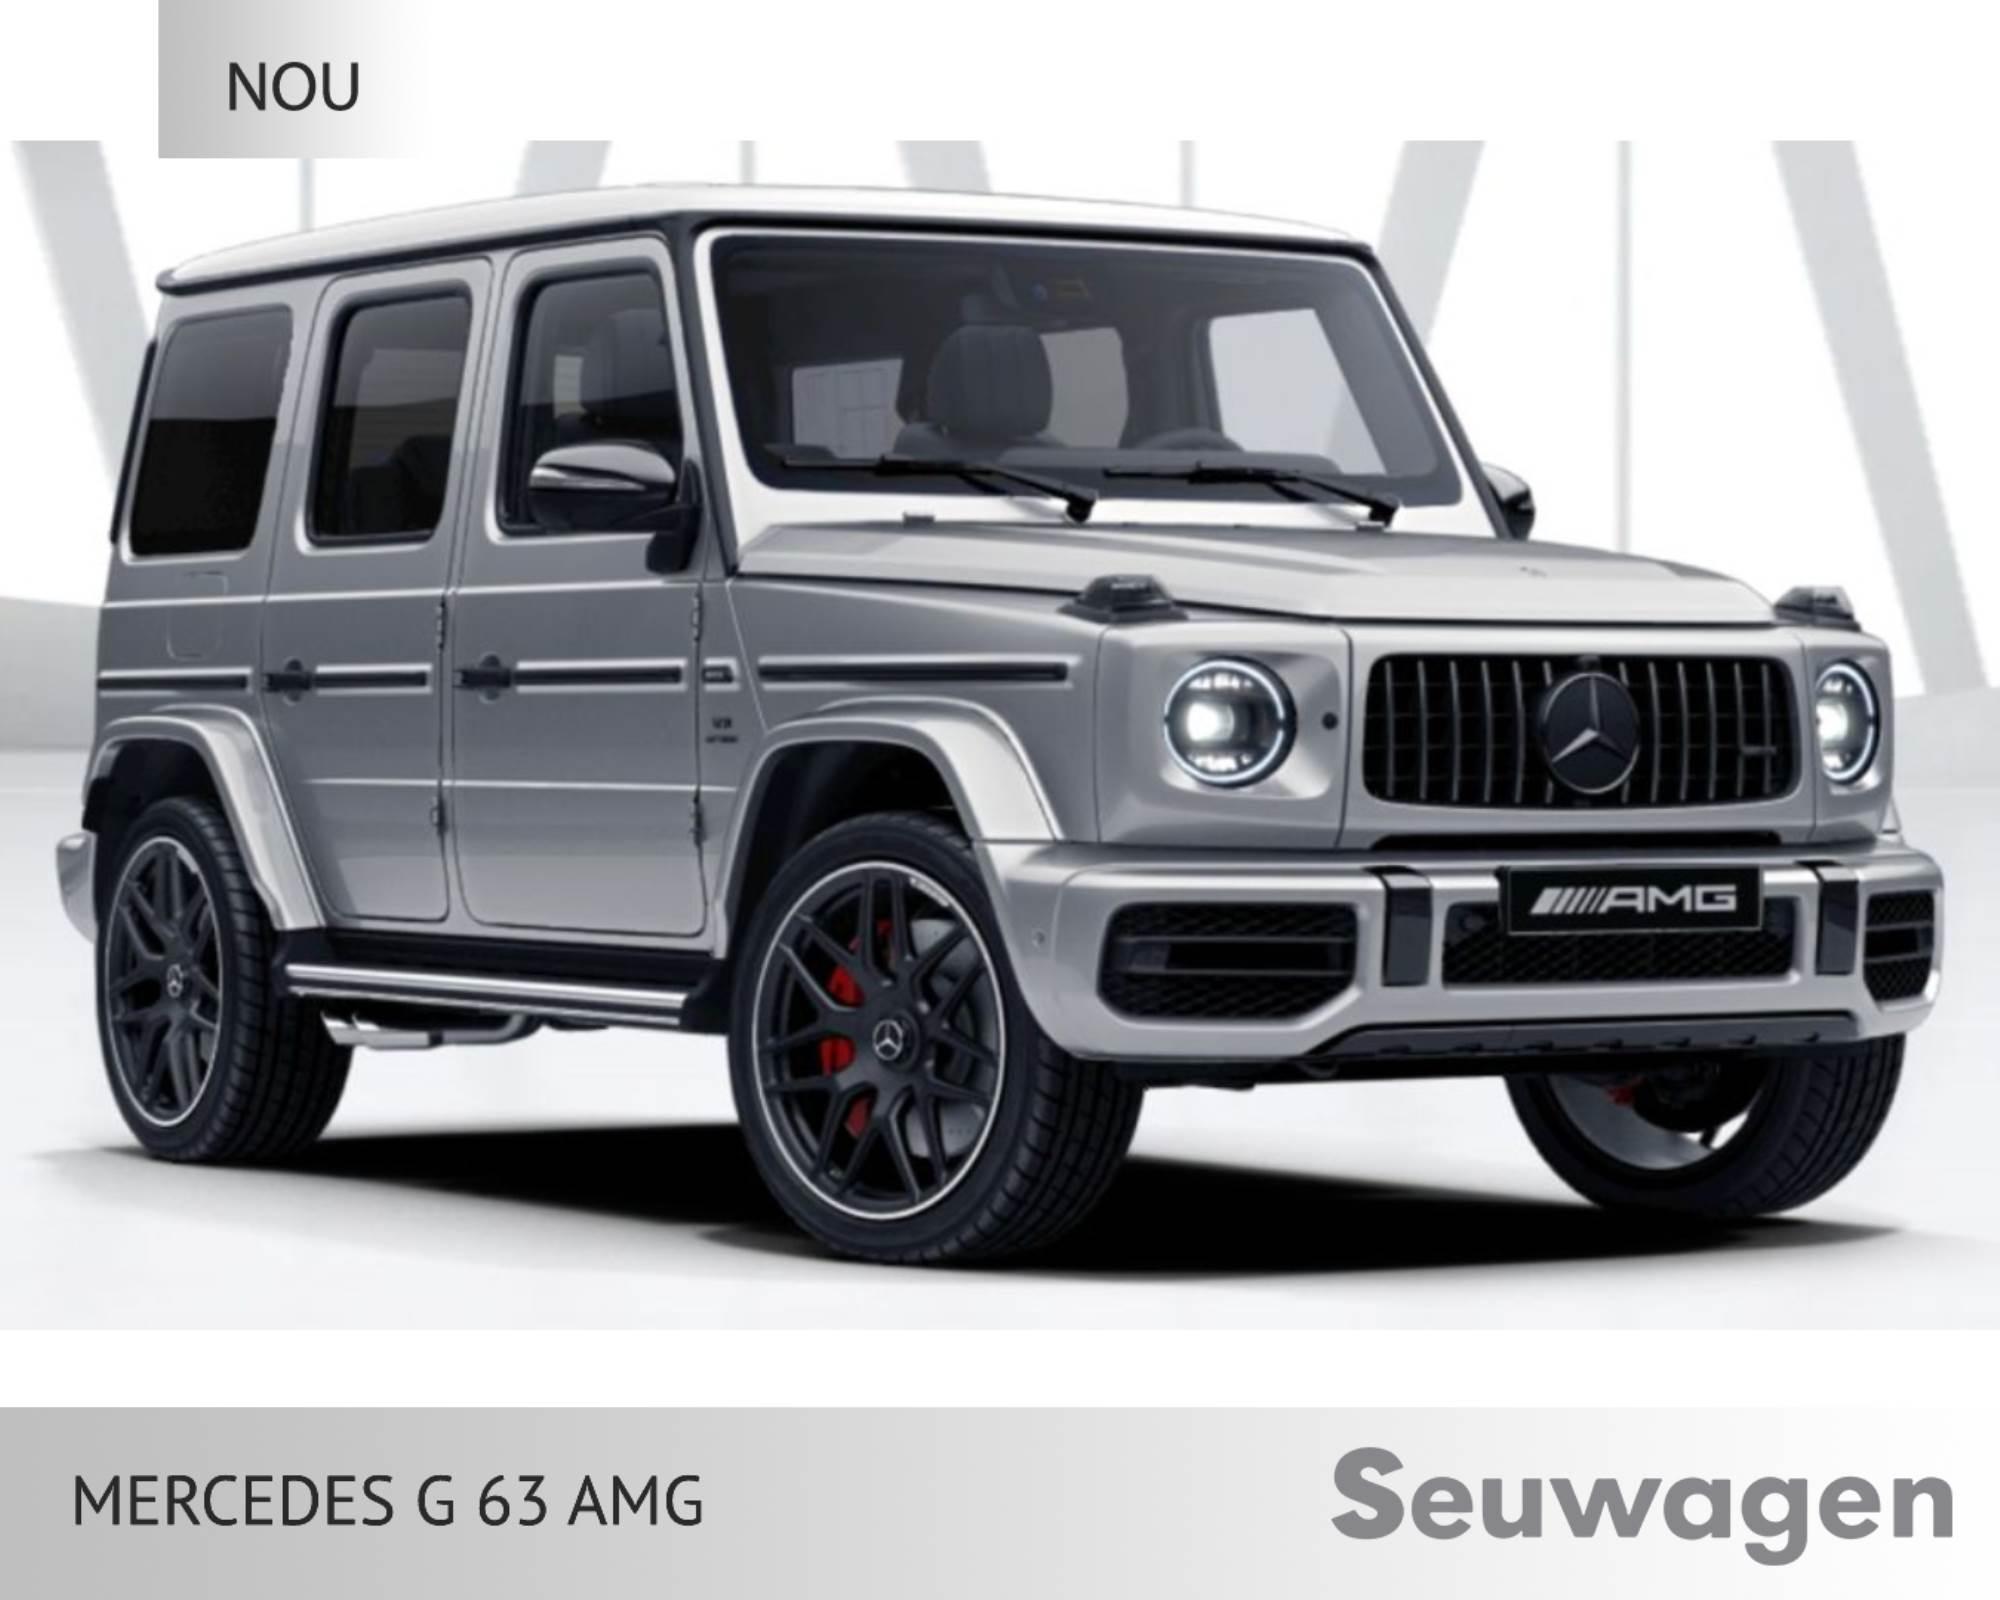 Mercedes-Benz - AMG G 63 - AMG G 63 AMG G 63 Benzina  2021  00 Km